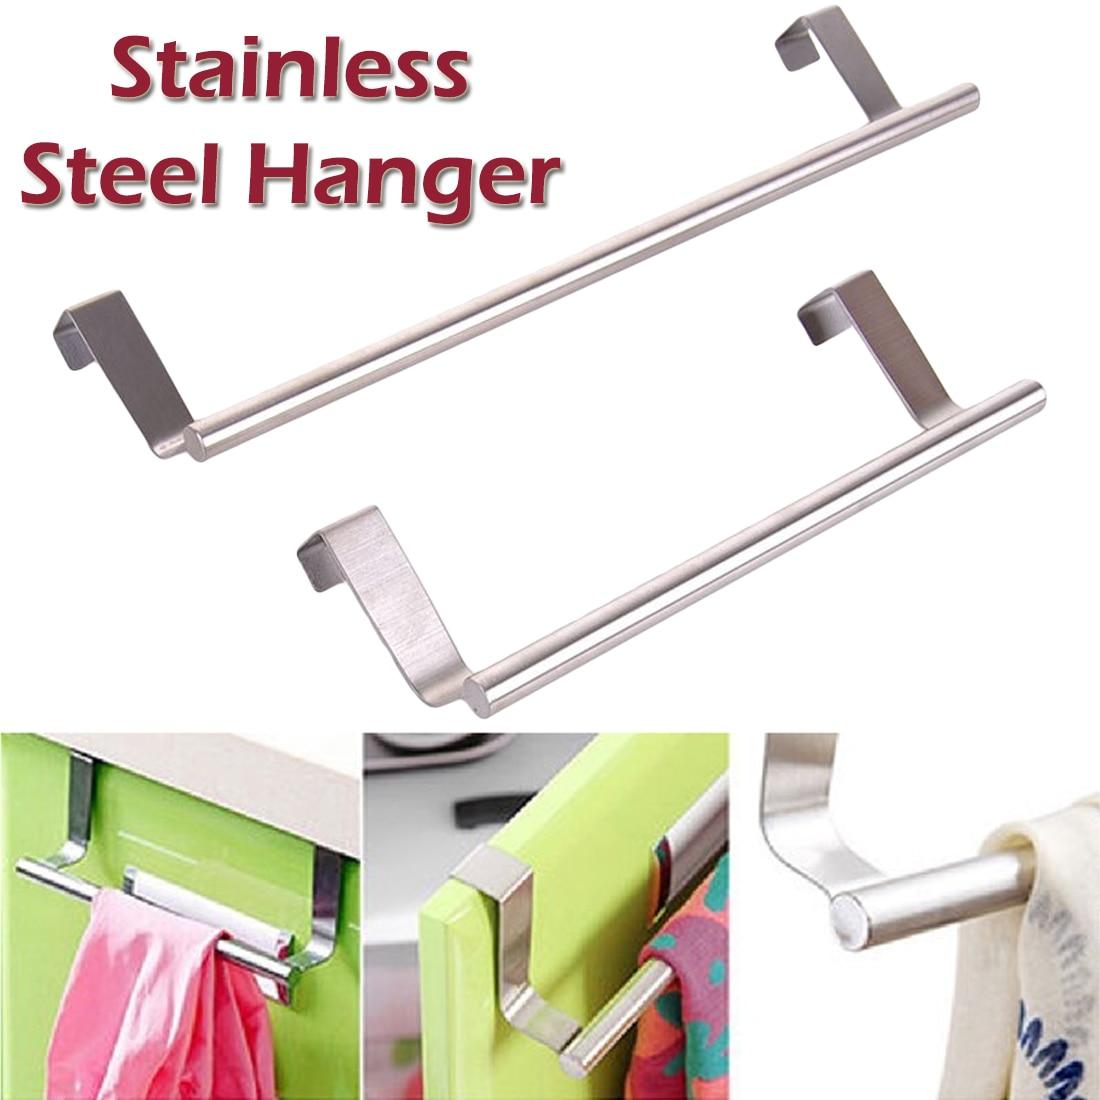 Cabinet Drawer Towel Hanging Rack Storage Holder Door Hanger Kitchen Bathroom Towel Hanger Wall Mounted Towel Holder